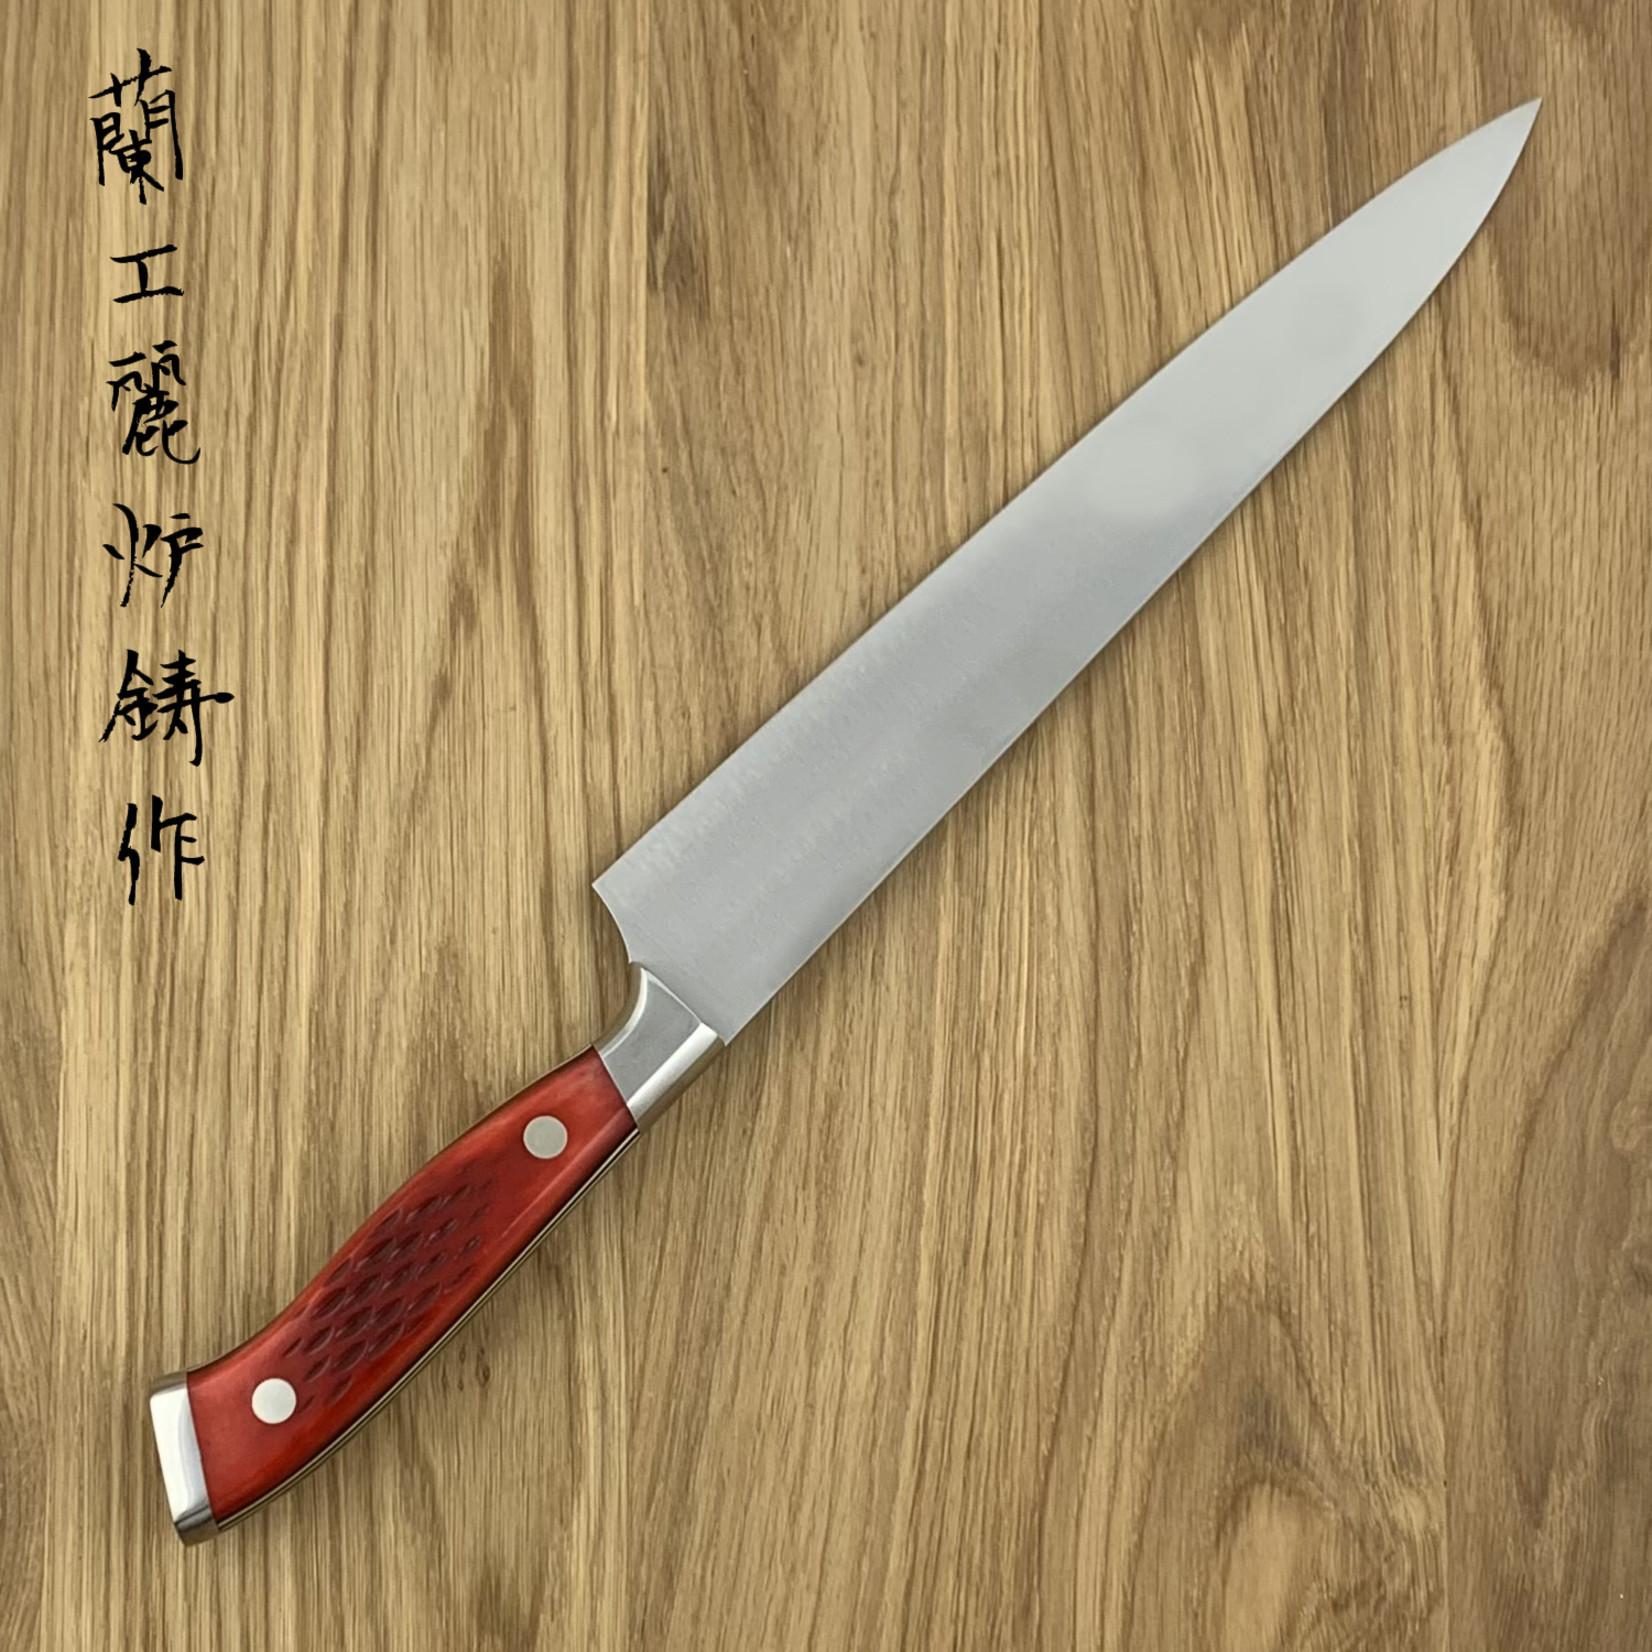 NENOHI NENOX Premium Rood Sujihiki 230 mm